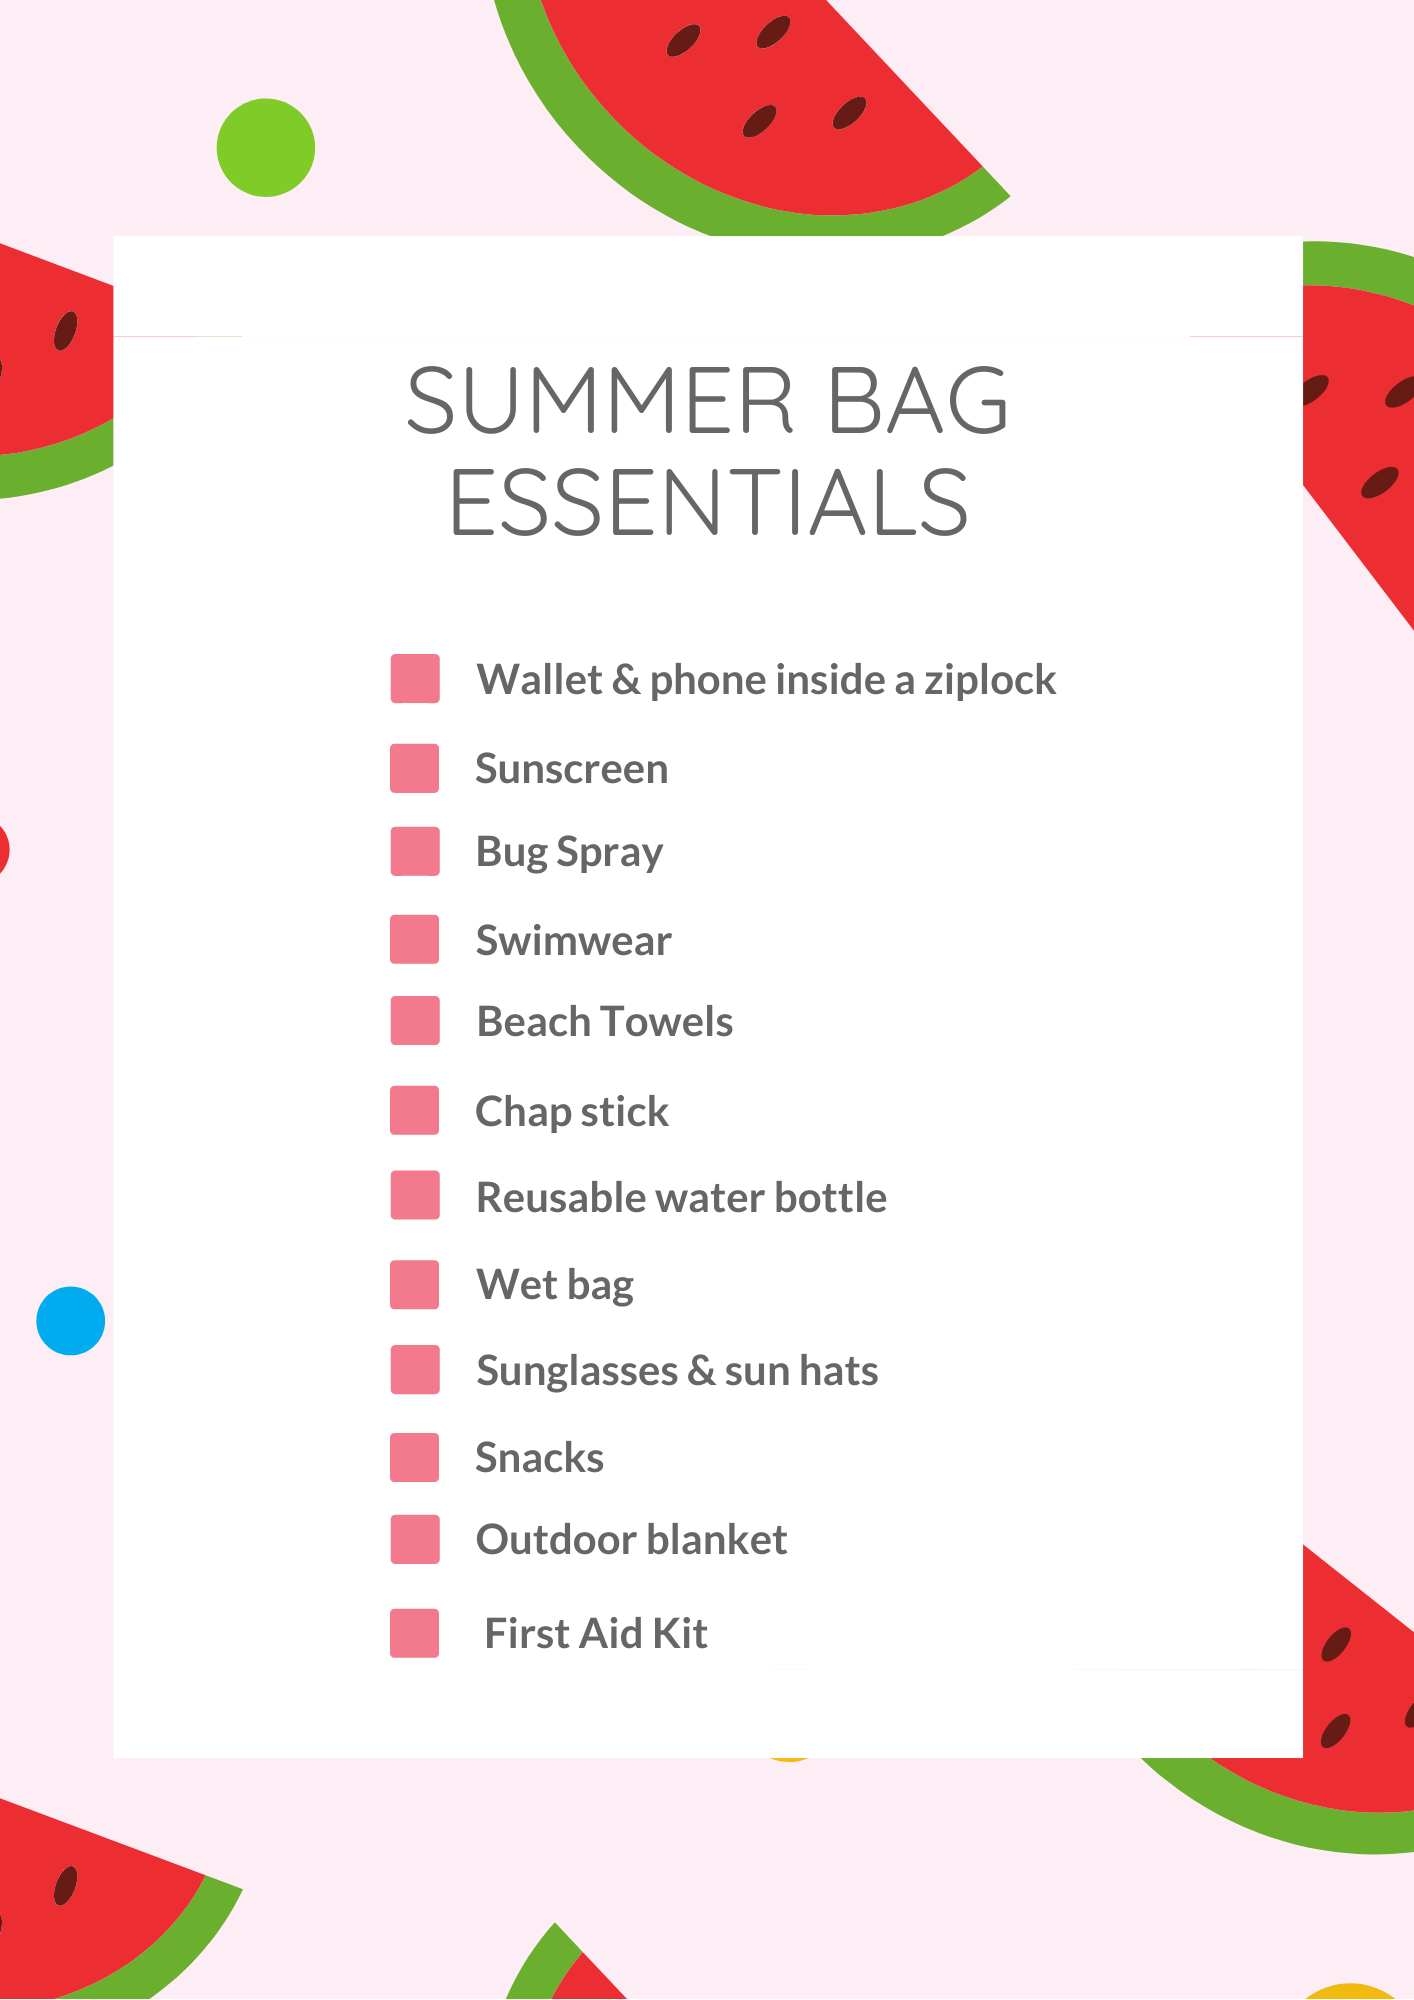 Summer Bag Essentials Graphic